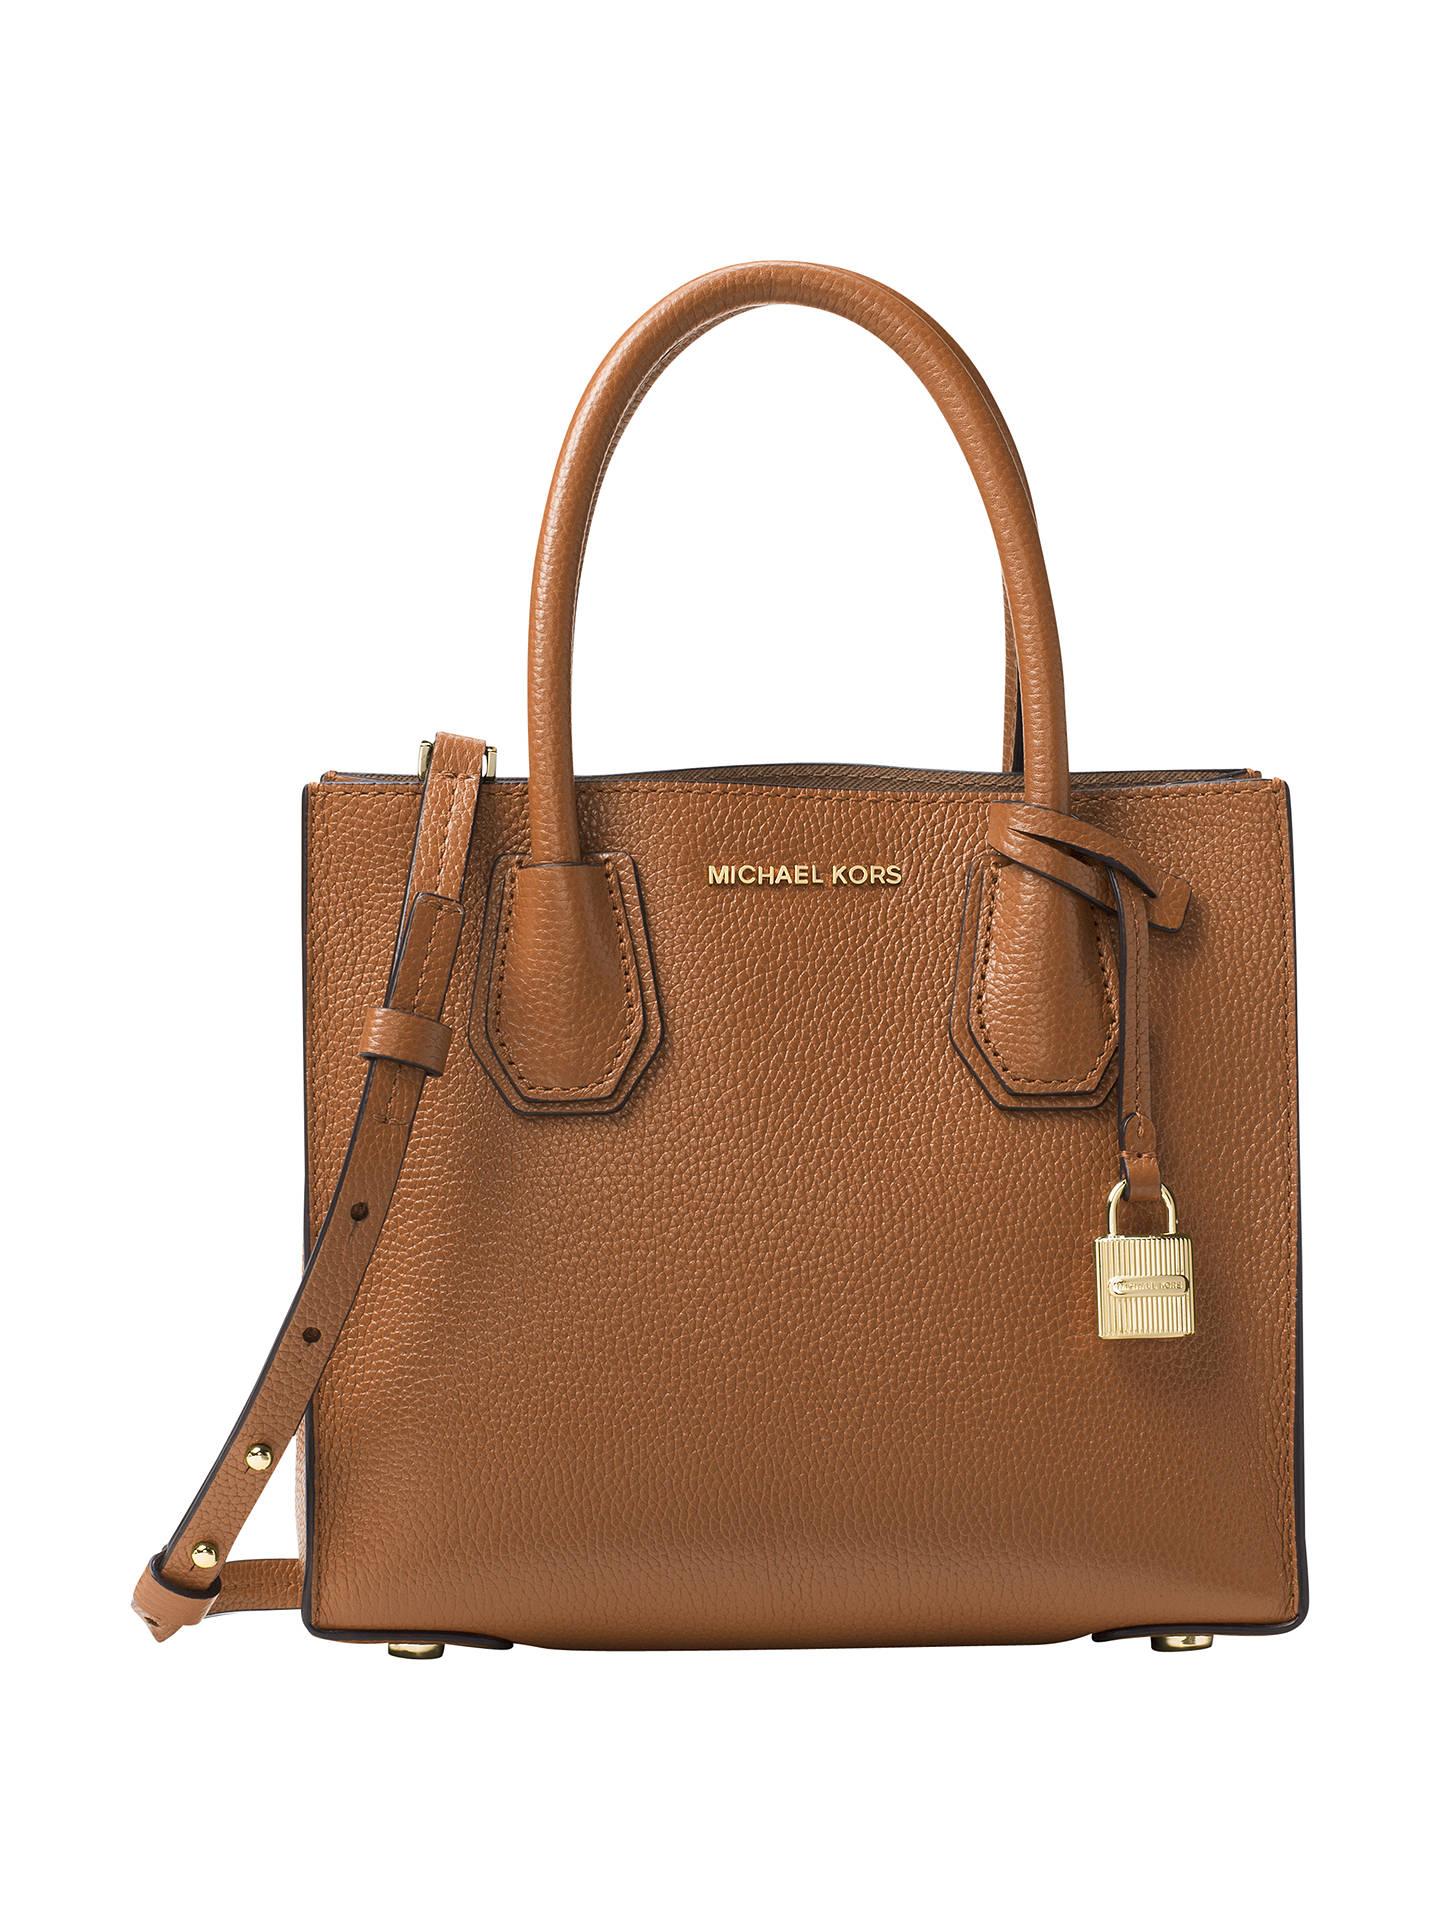 33a7ac0b6622 Buy MICHAEL Michael Kors Mercer Leather Cross Body Bag, Luggage Online at  johnlewis.com ...